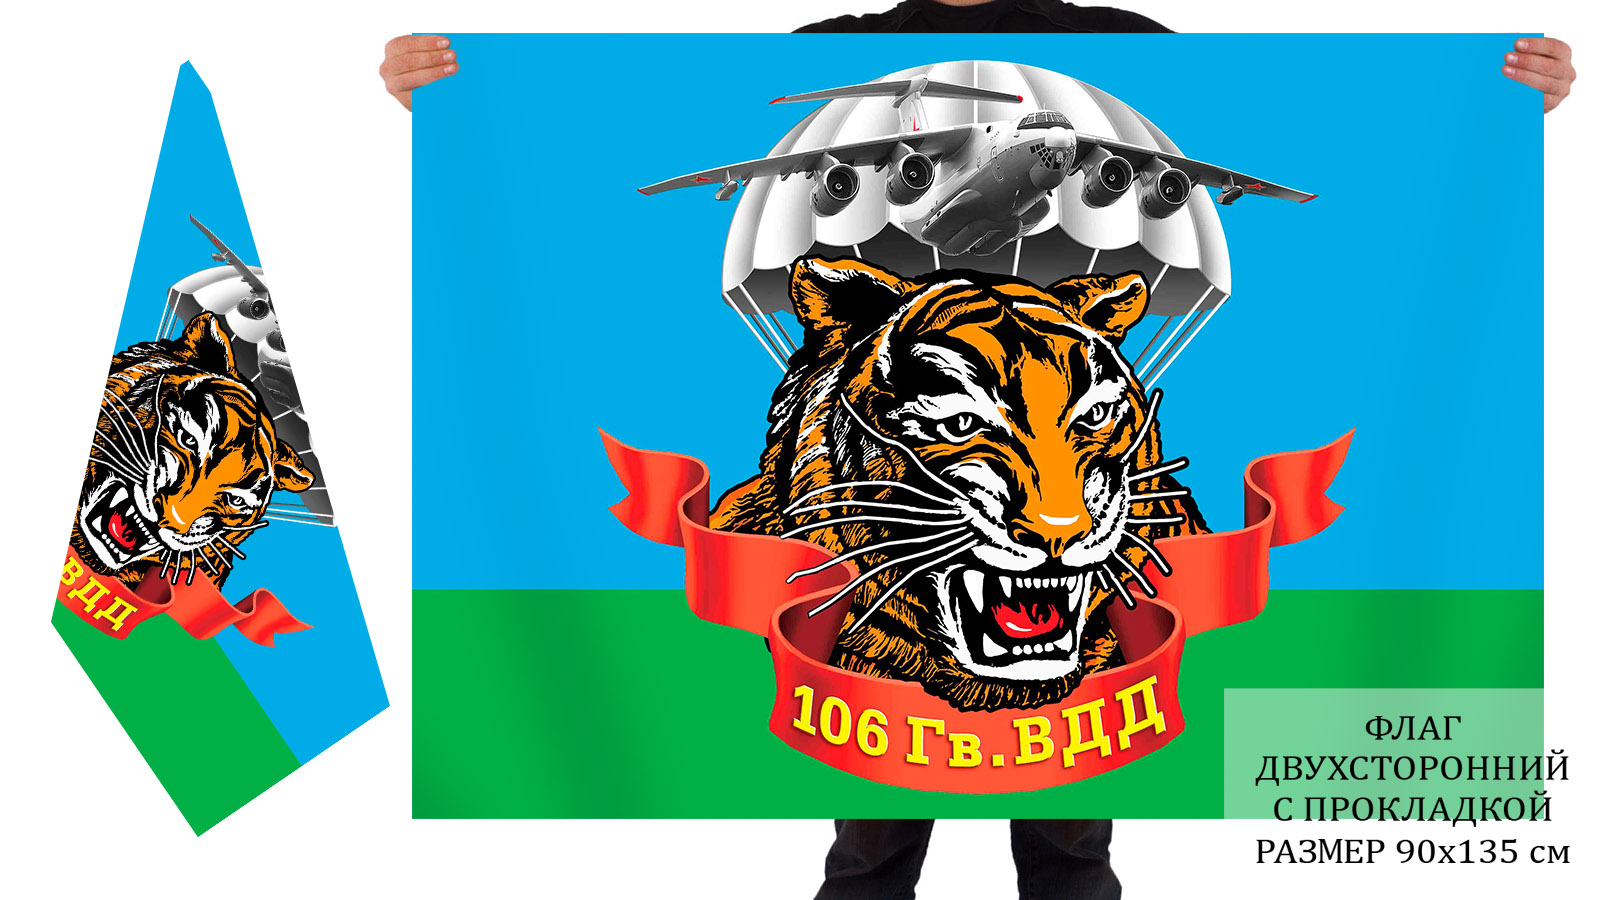 Двусторонний флаг 106 гвардейской воздушно-десантной дивизии